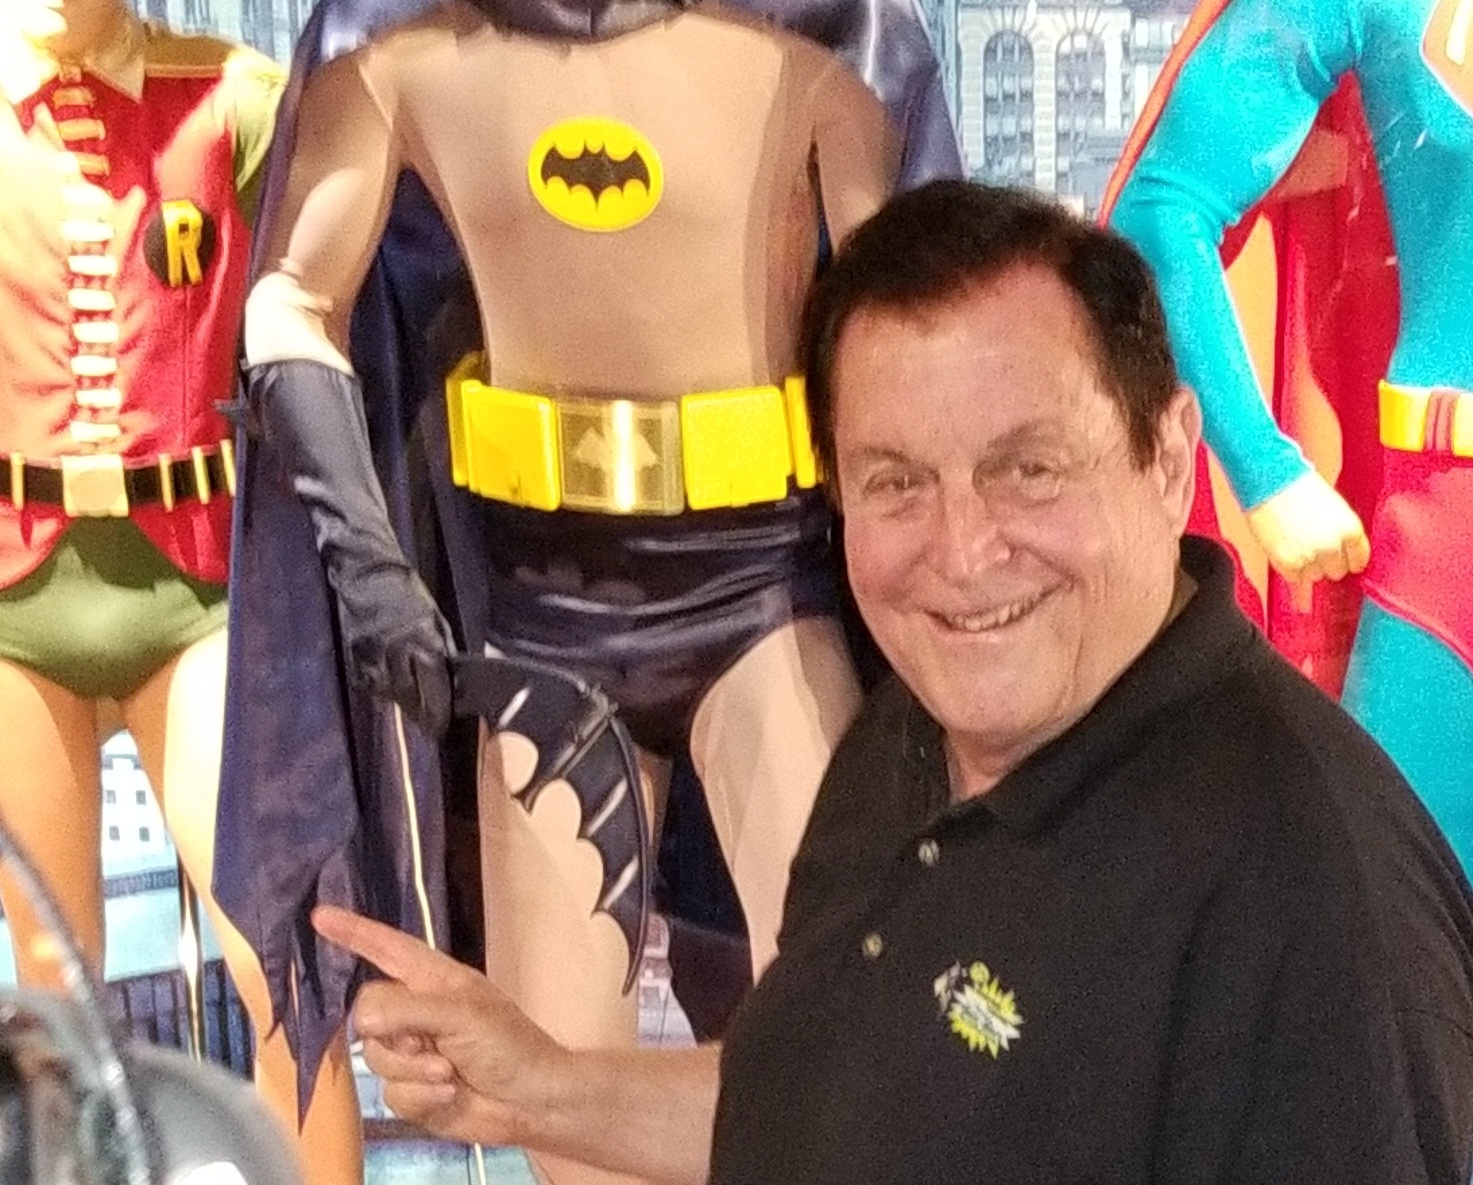 Burt Ward at The Hollywood Museum